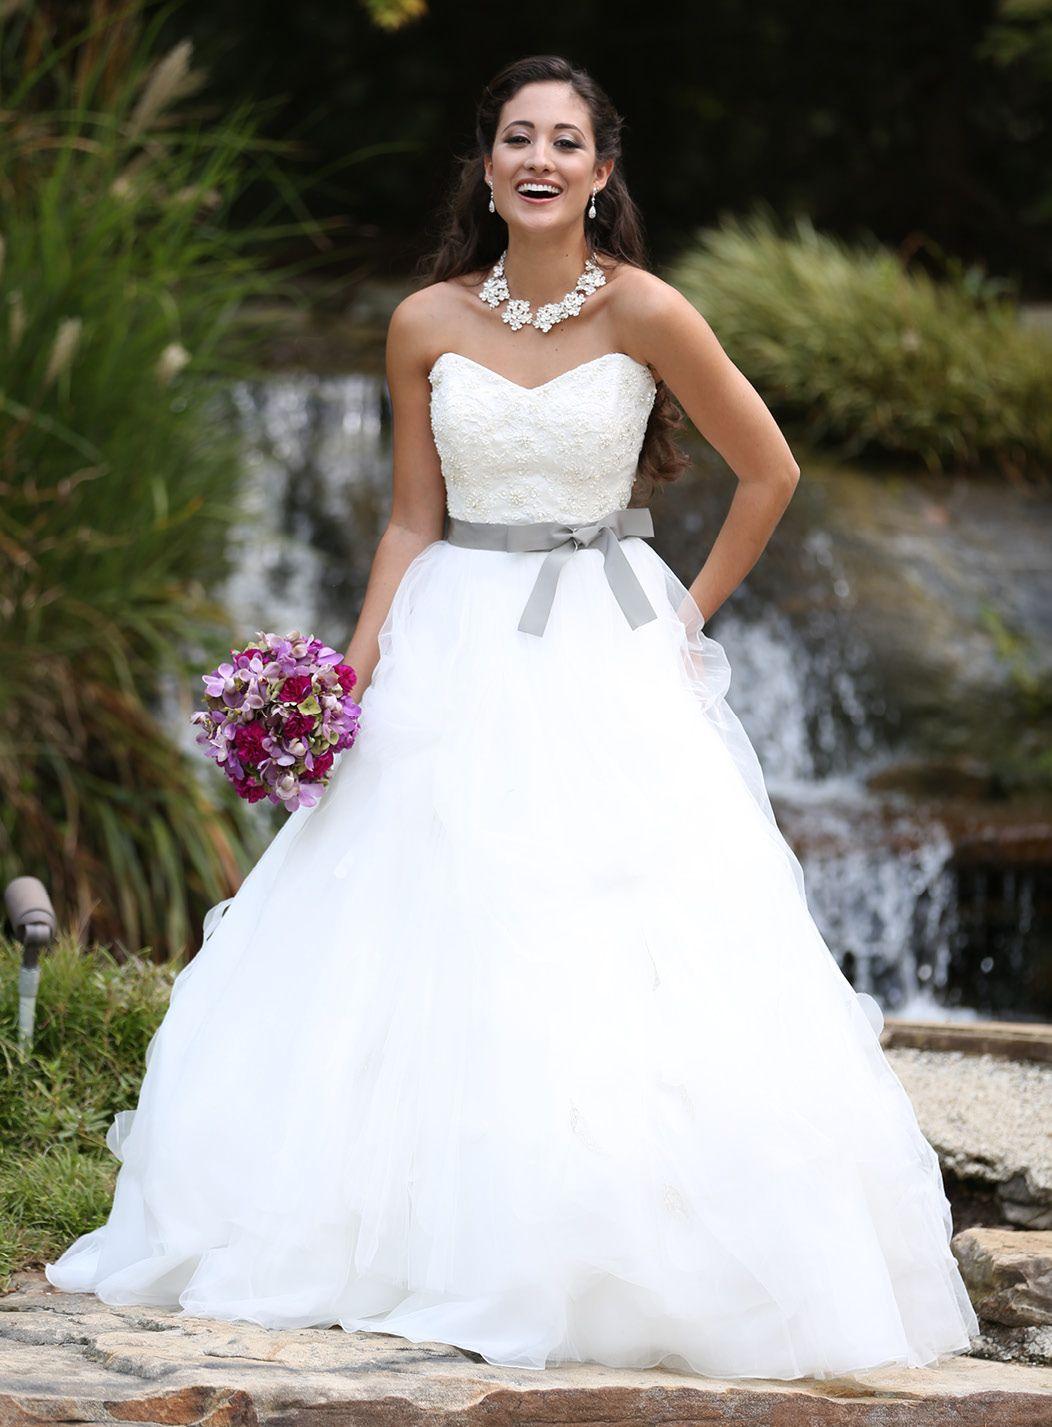 Ansley Wedding Dresses Atlanta Wedding Dresses Bridal